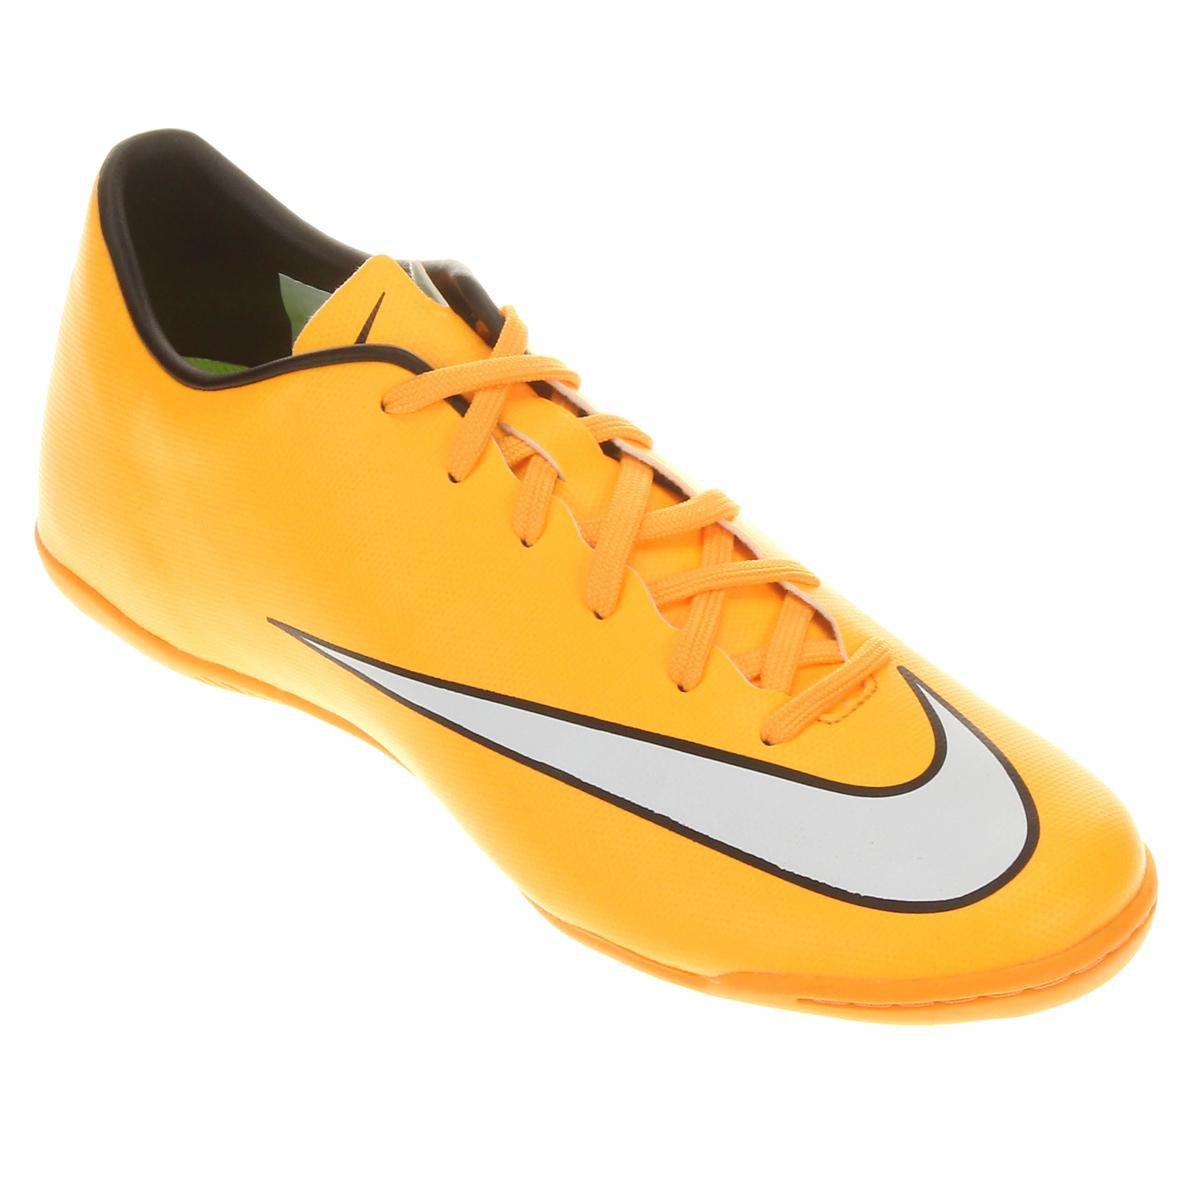 Chuteira Futsal Nike Mercurial Victory 5 IC - Compre Agora  46b371aa31049